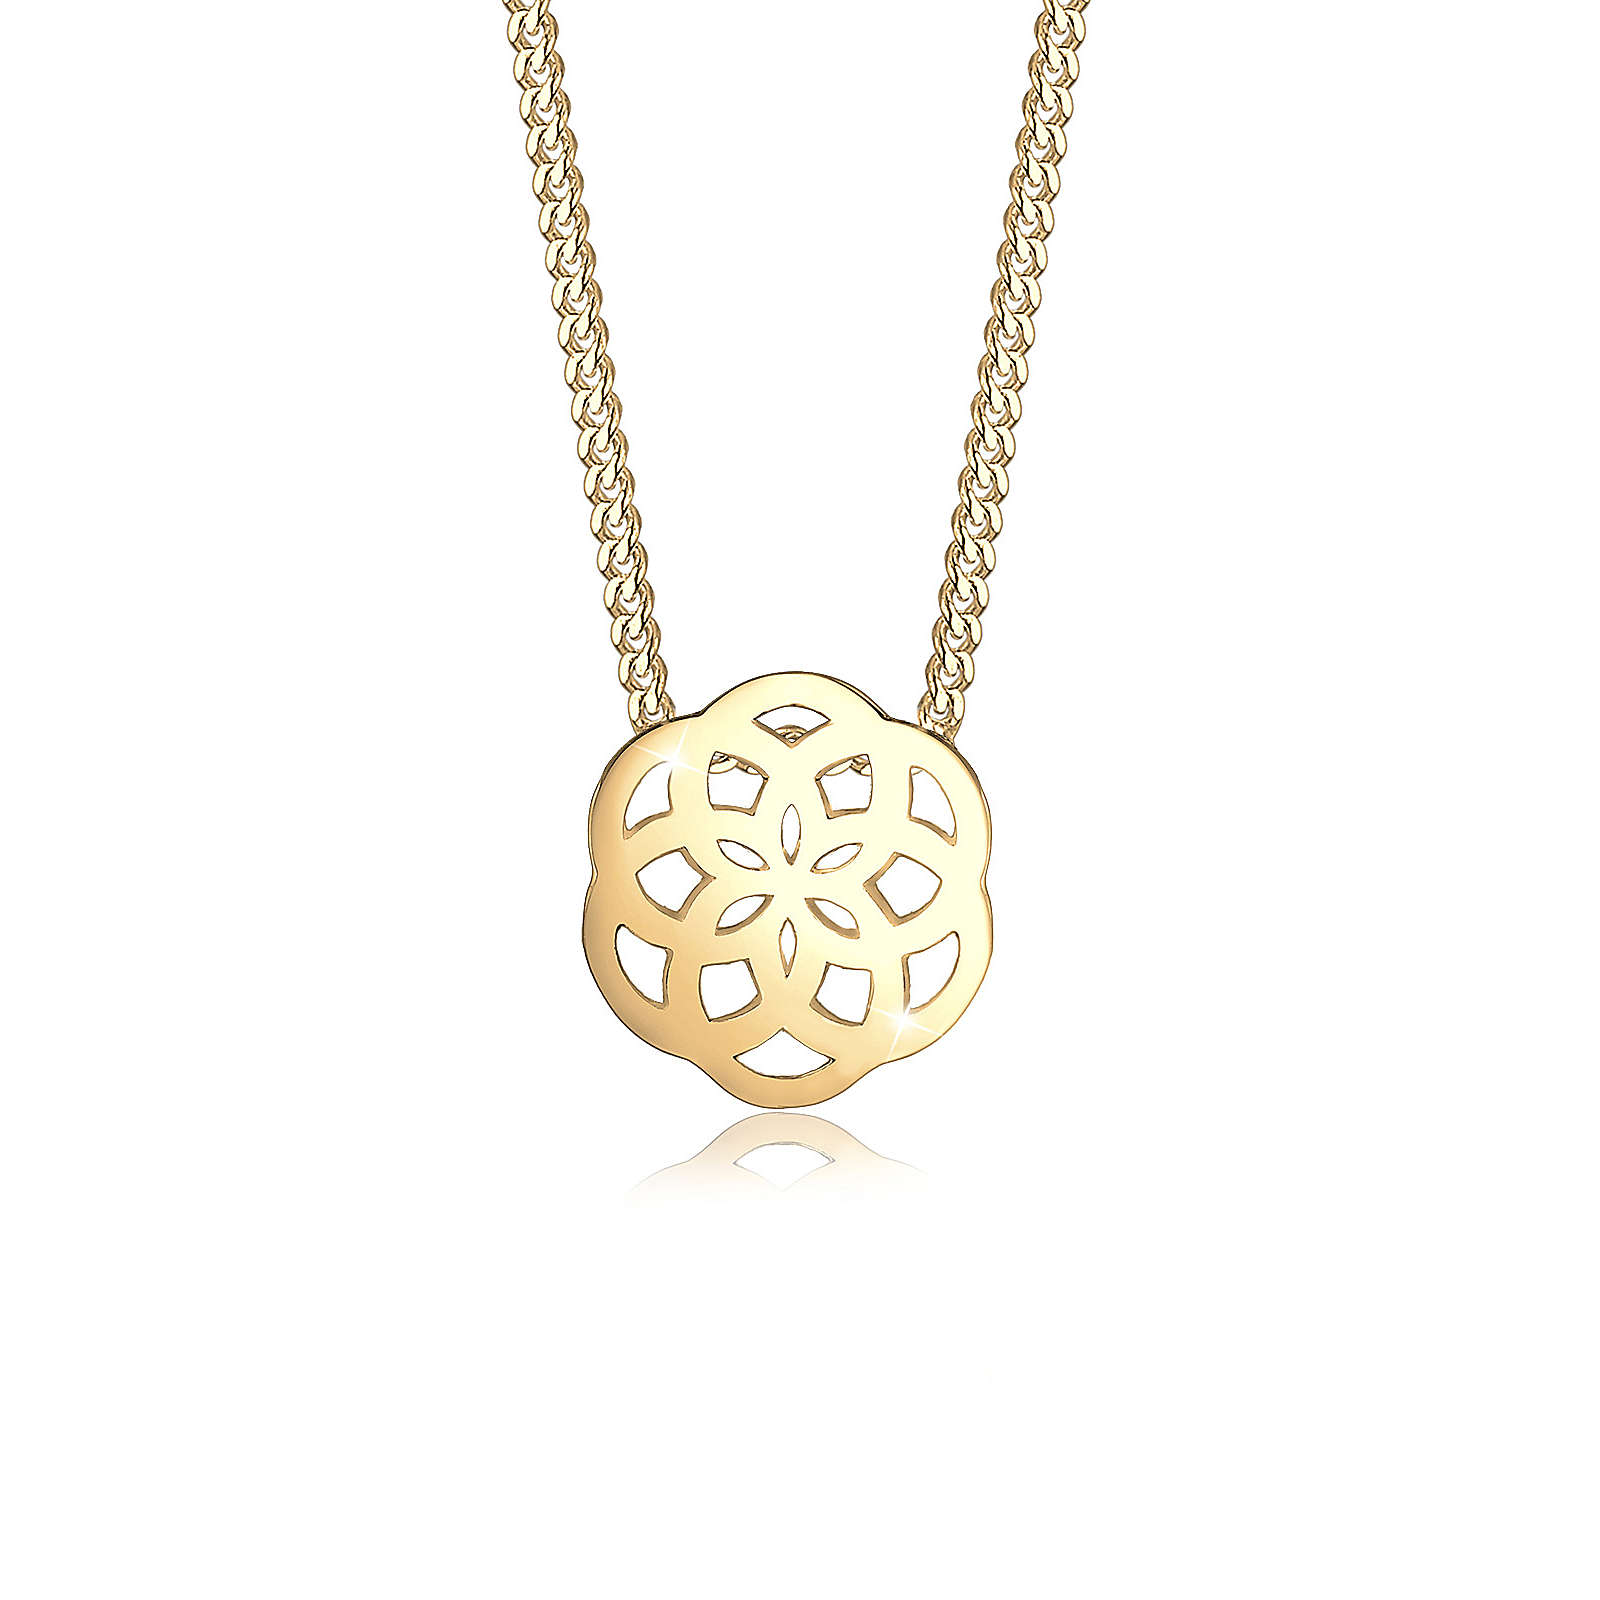 Elli PREMIUM Halskette Ornament Blüte Floral Edel Cut-Out 585 Gelbgold Halsketten gold Damen